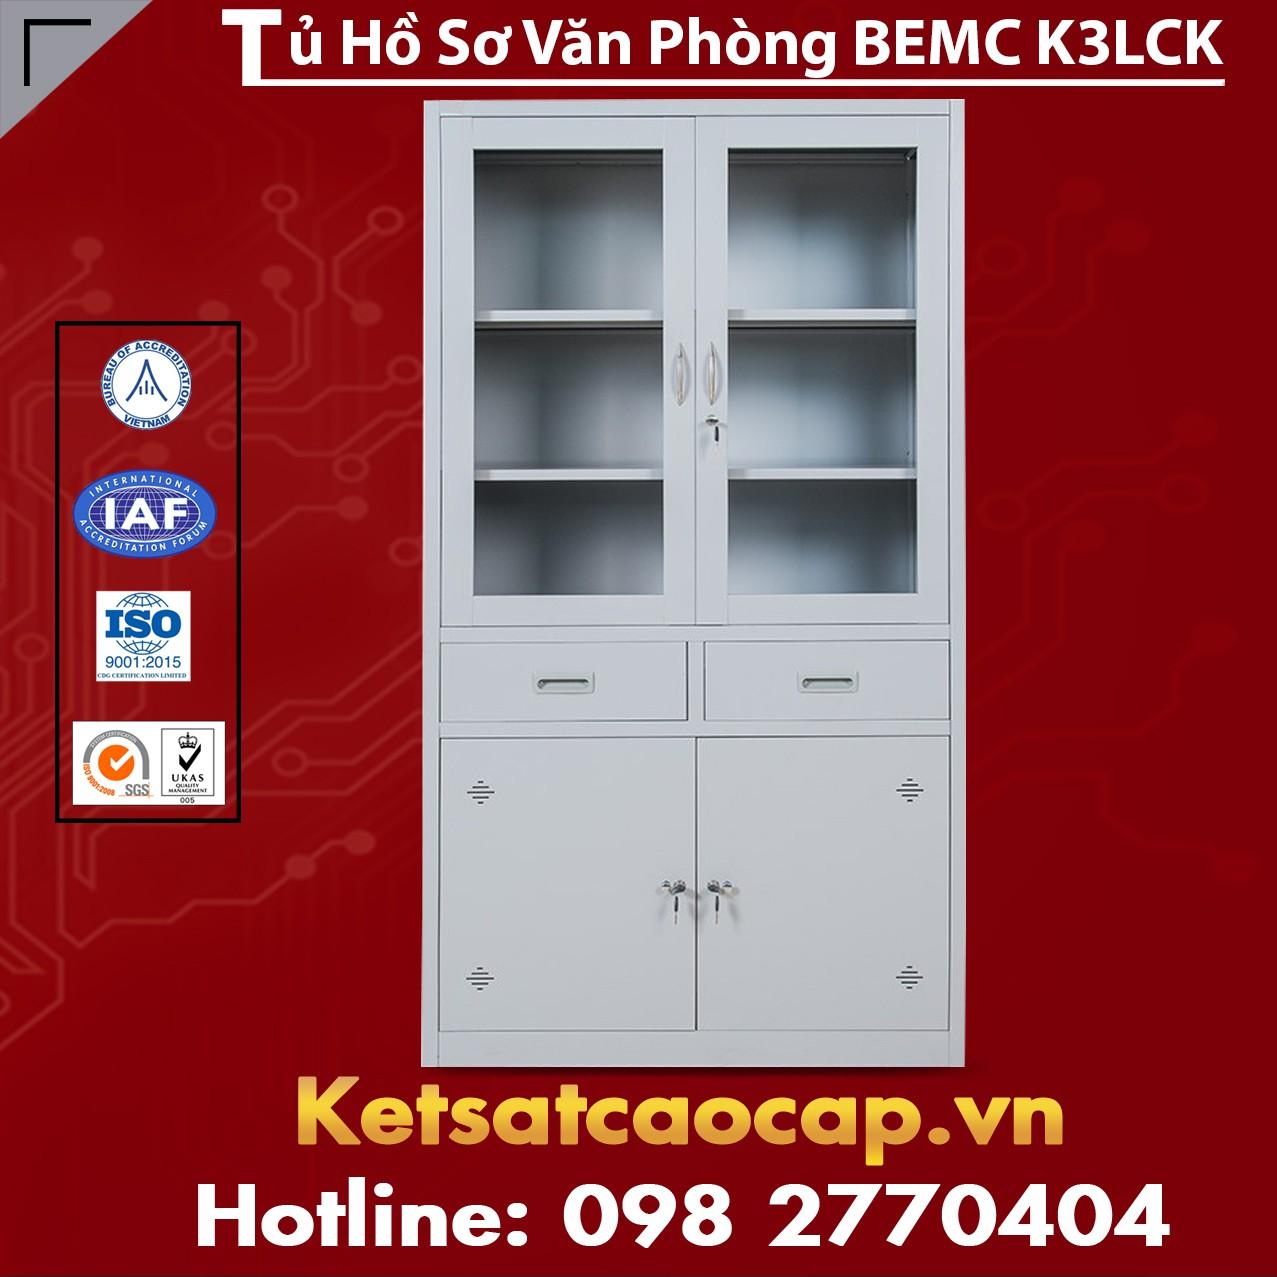 Tủ Hồ Sơ BEMC K3LCK